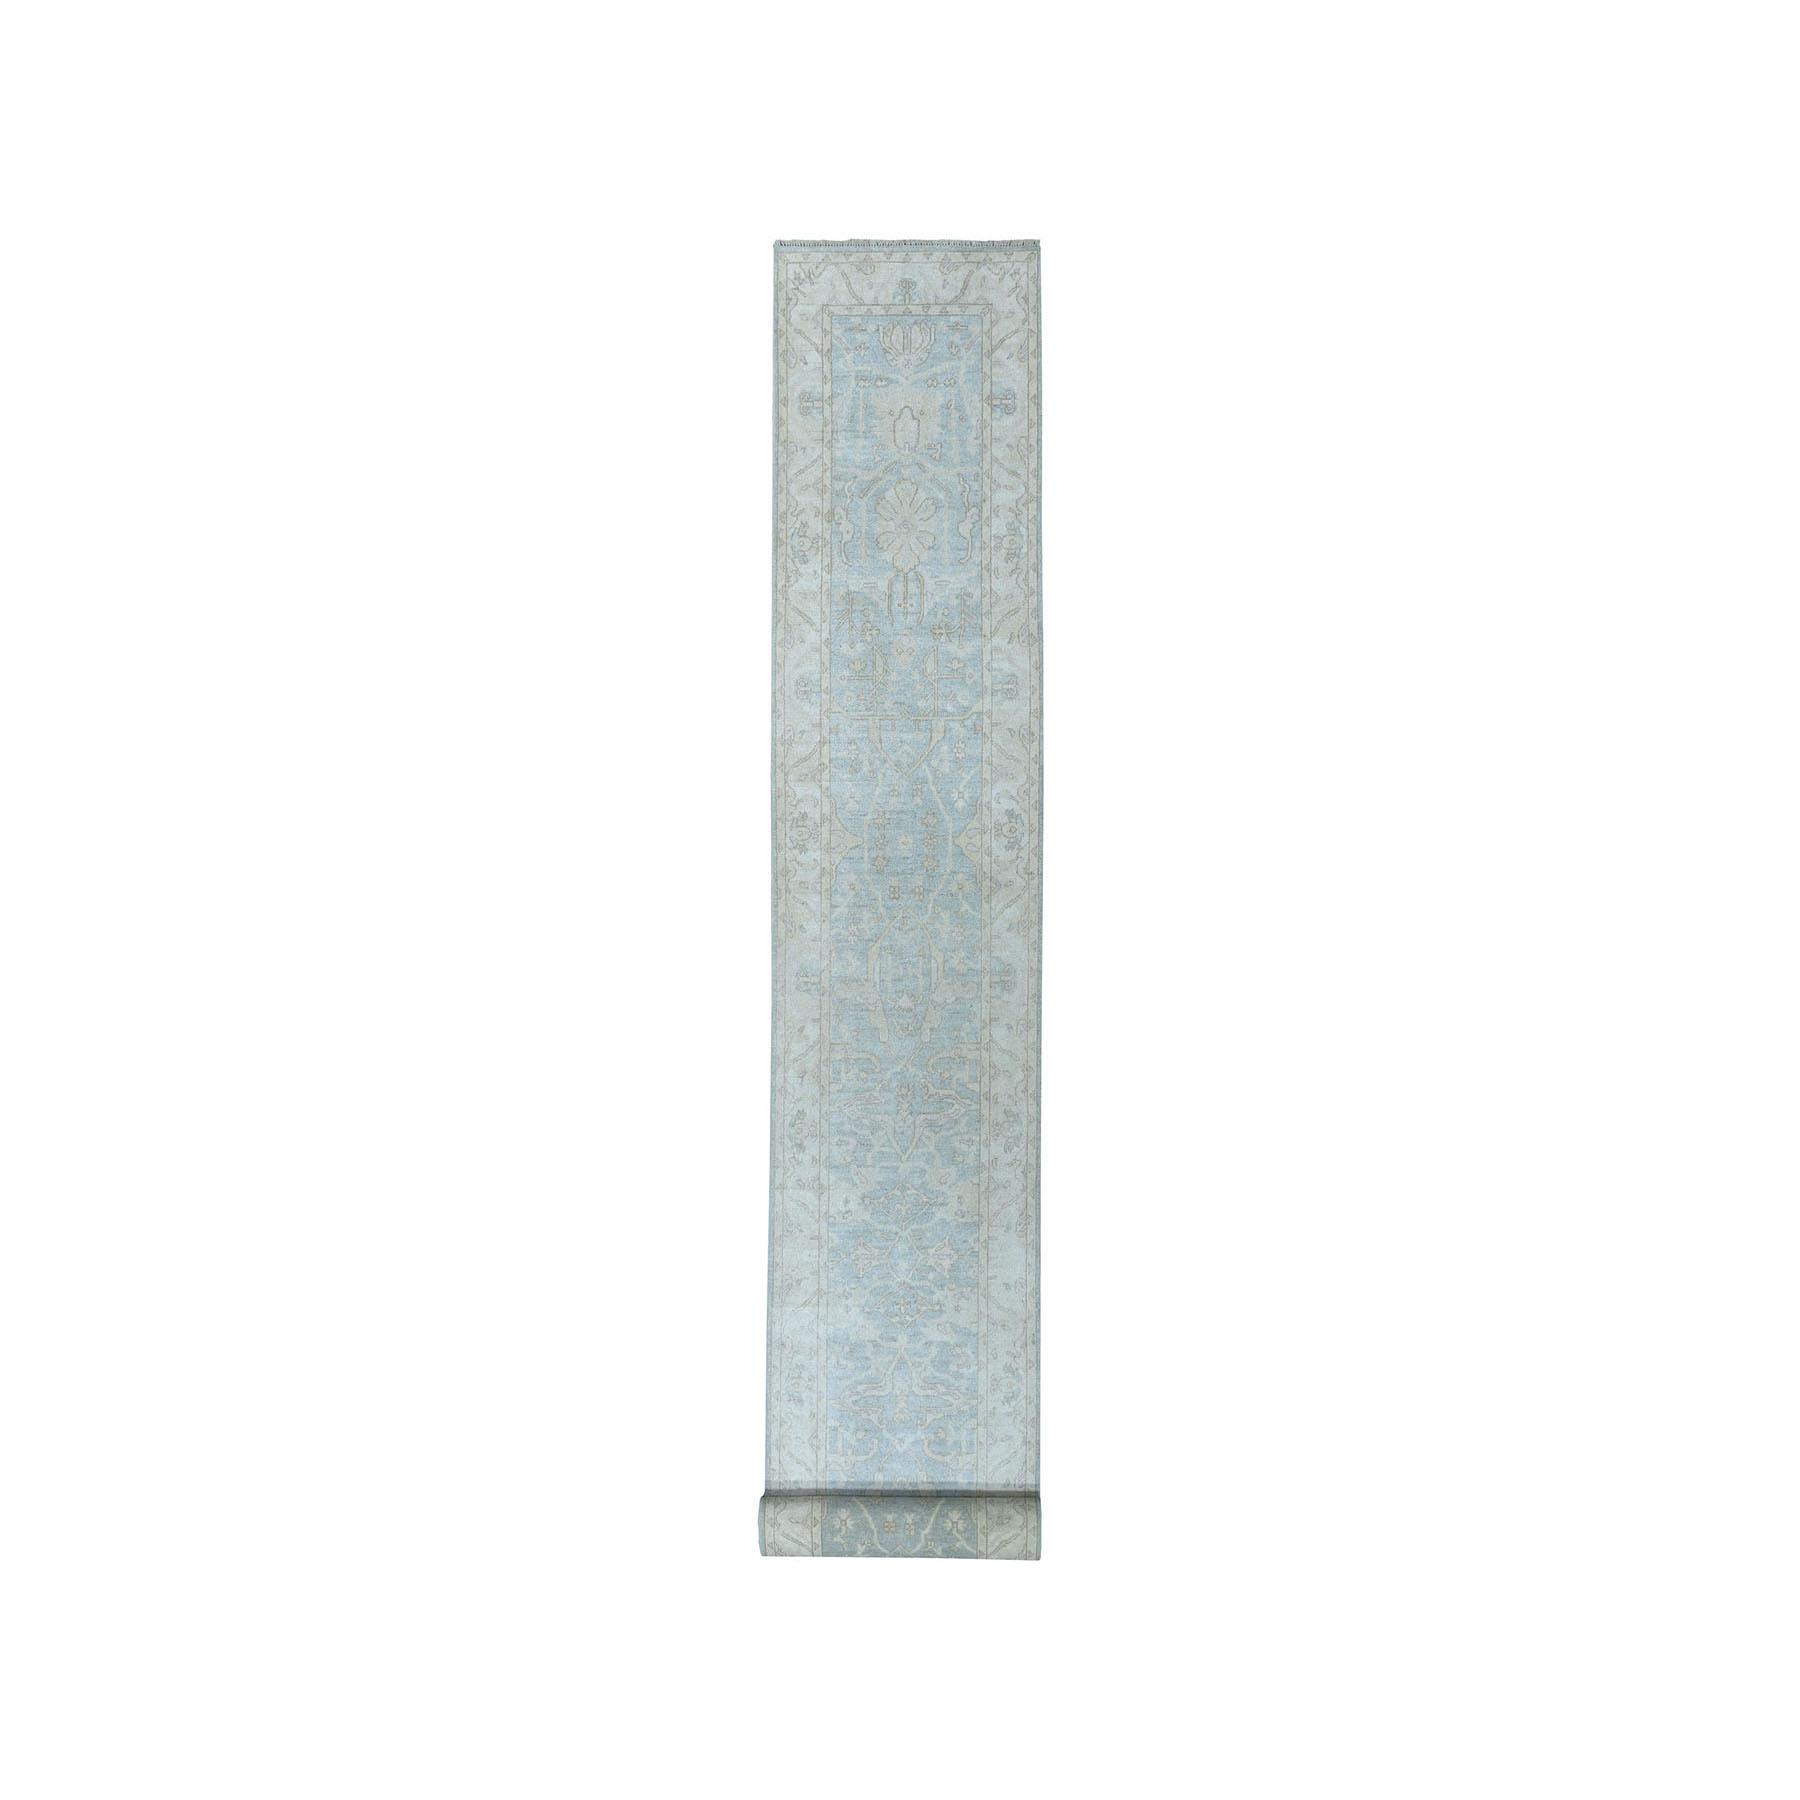 "2'8""X16' White Wash Peshawar Pure Wool Hand-Knotted Xl Runner Oriental Rug moaea09b"